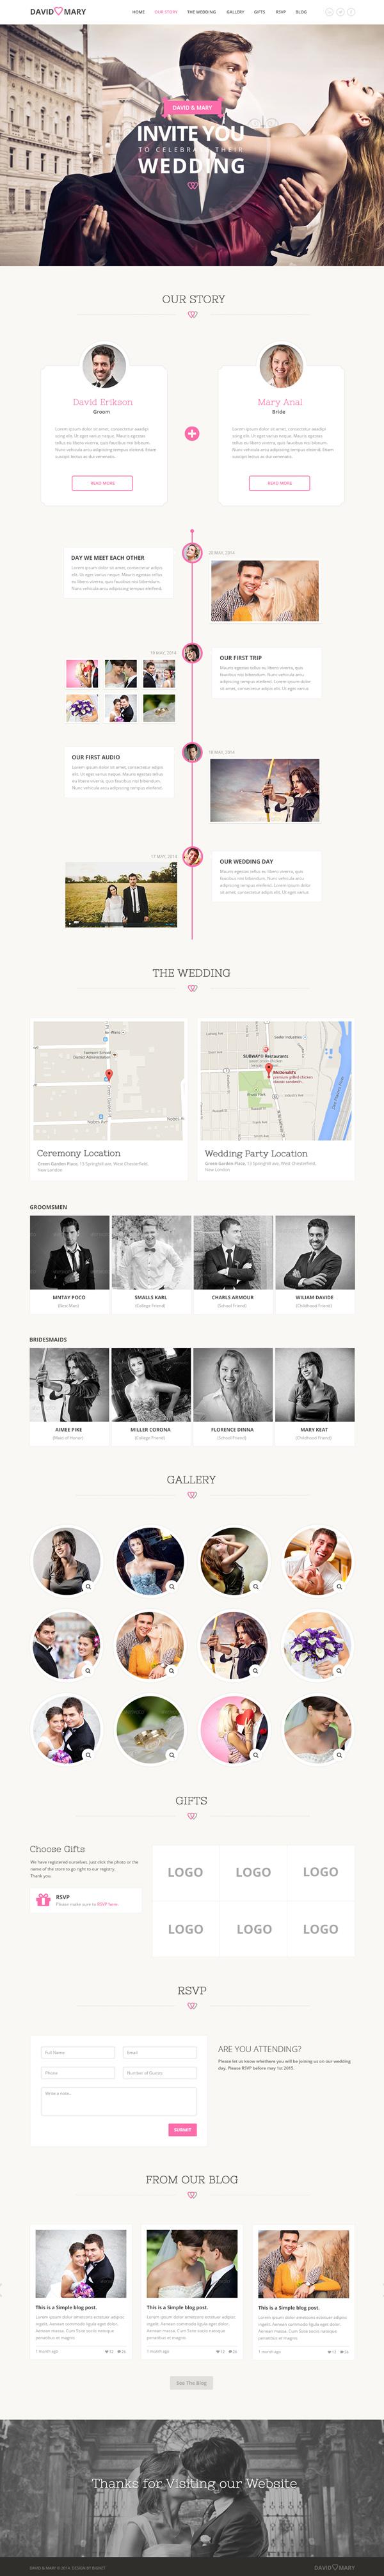 David & Mary - Event & Wedding PSD HTML5 Template